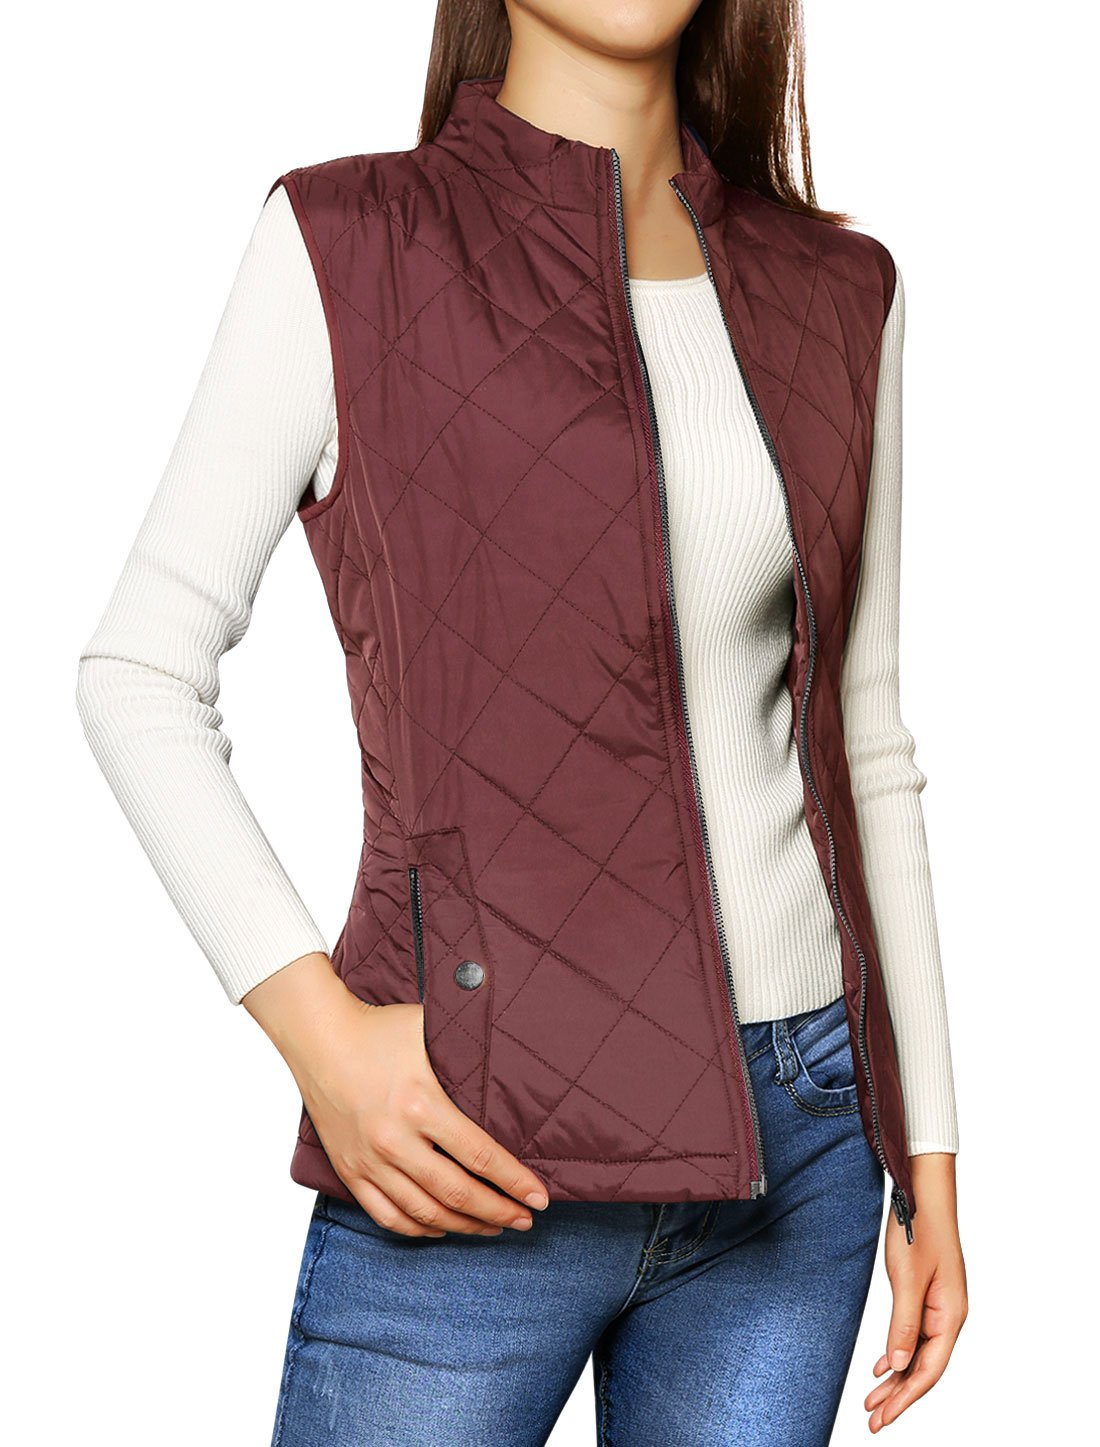 Allegra K Women's Stand Collar Lightweight Gilet Quilted Zip Vest Red M (US 10)